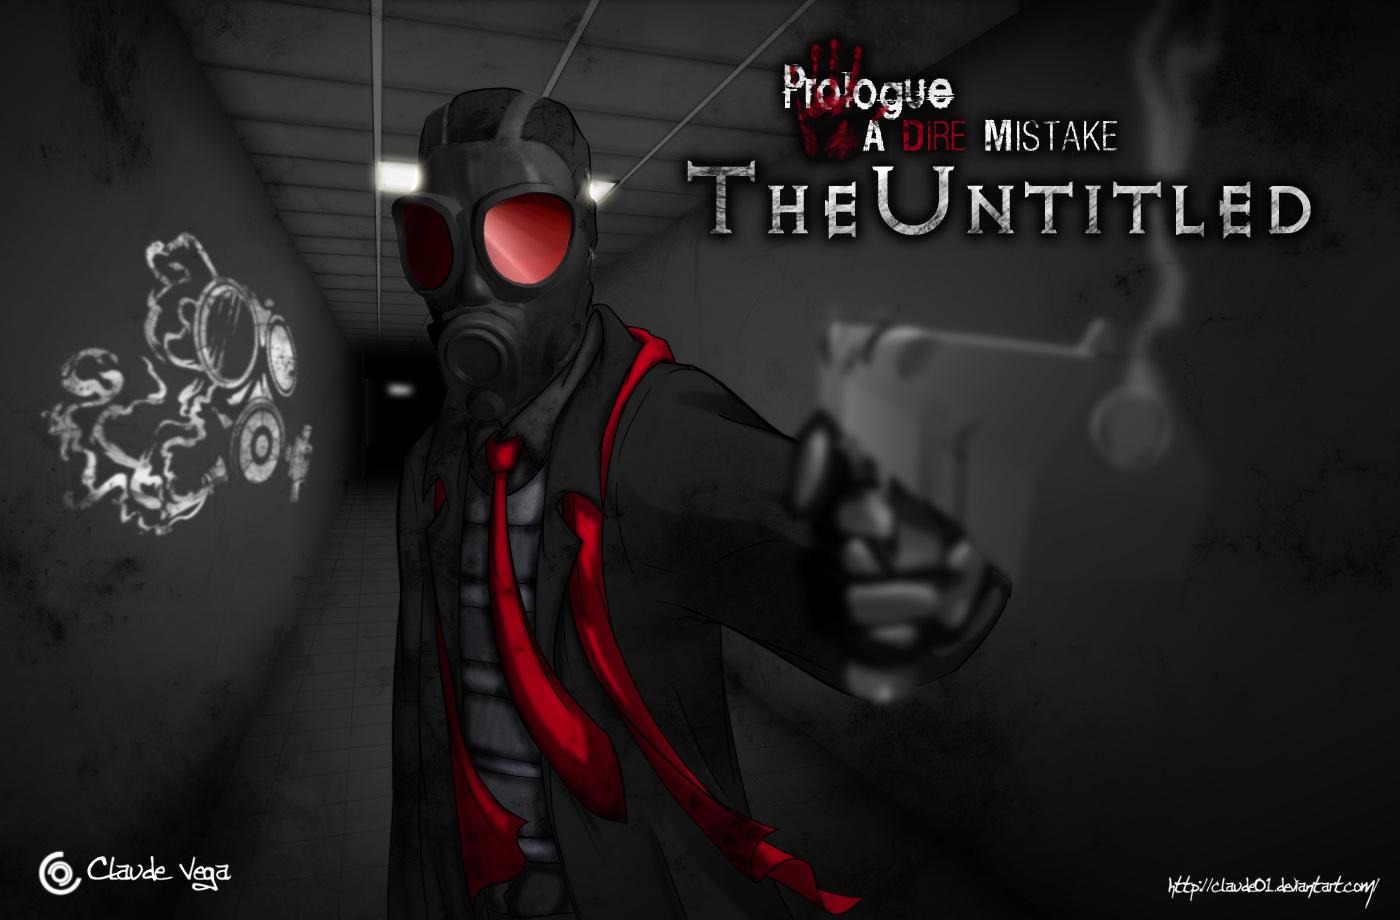 TheUntitled